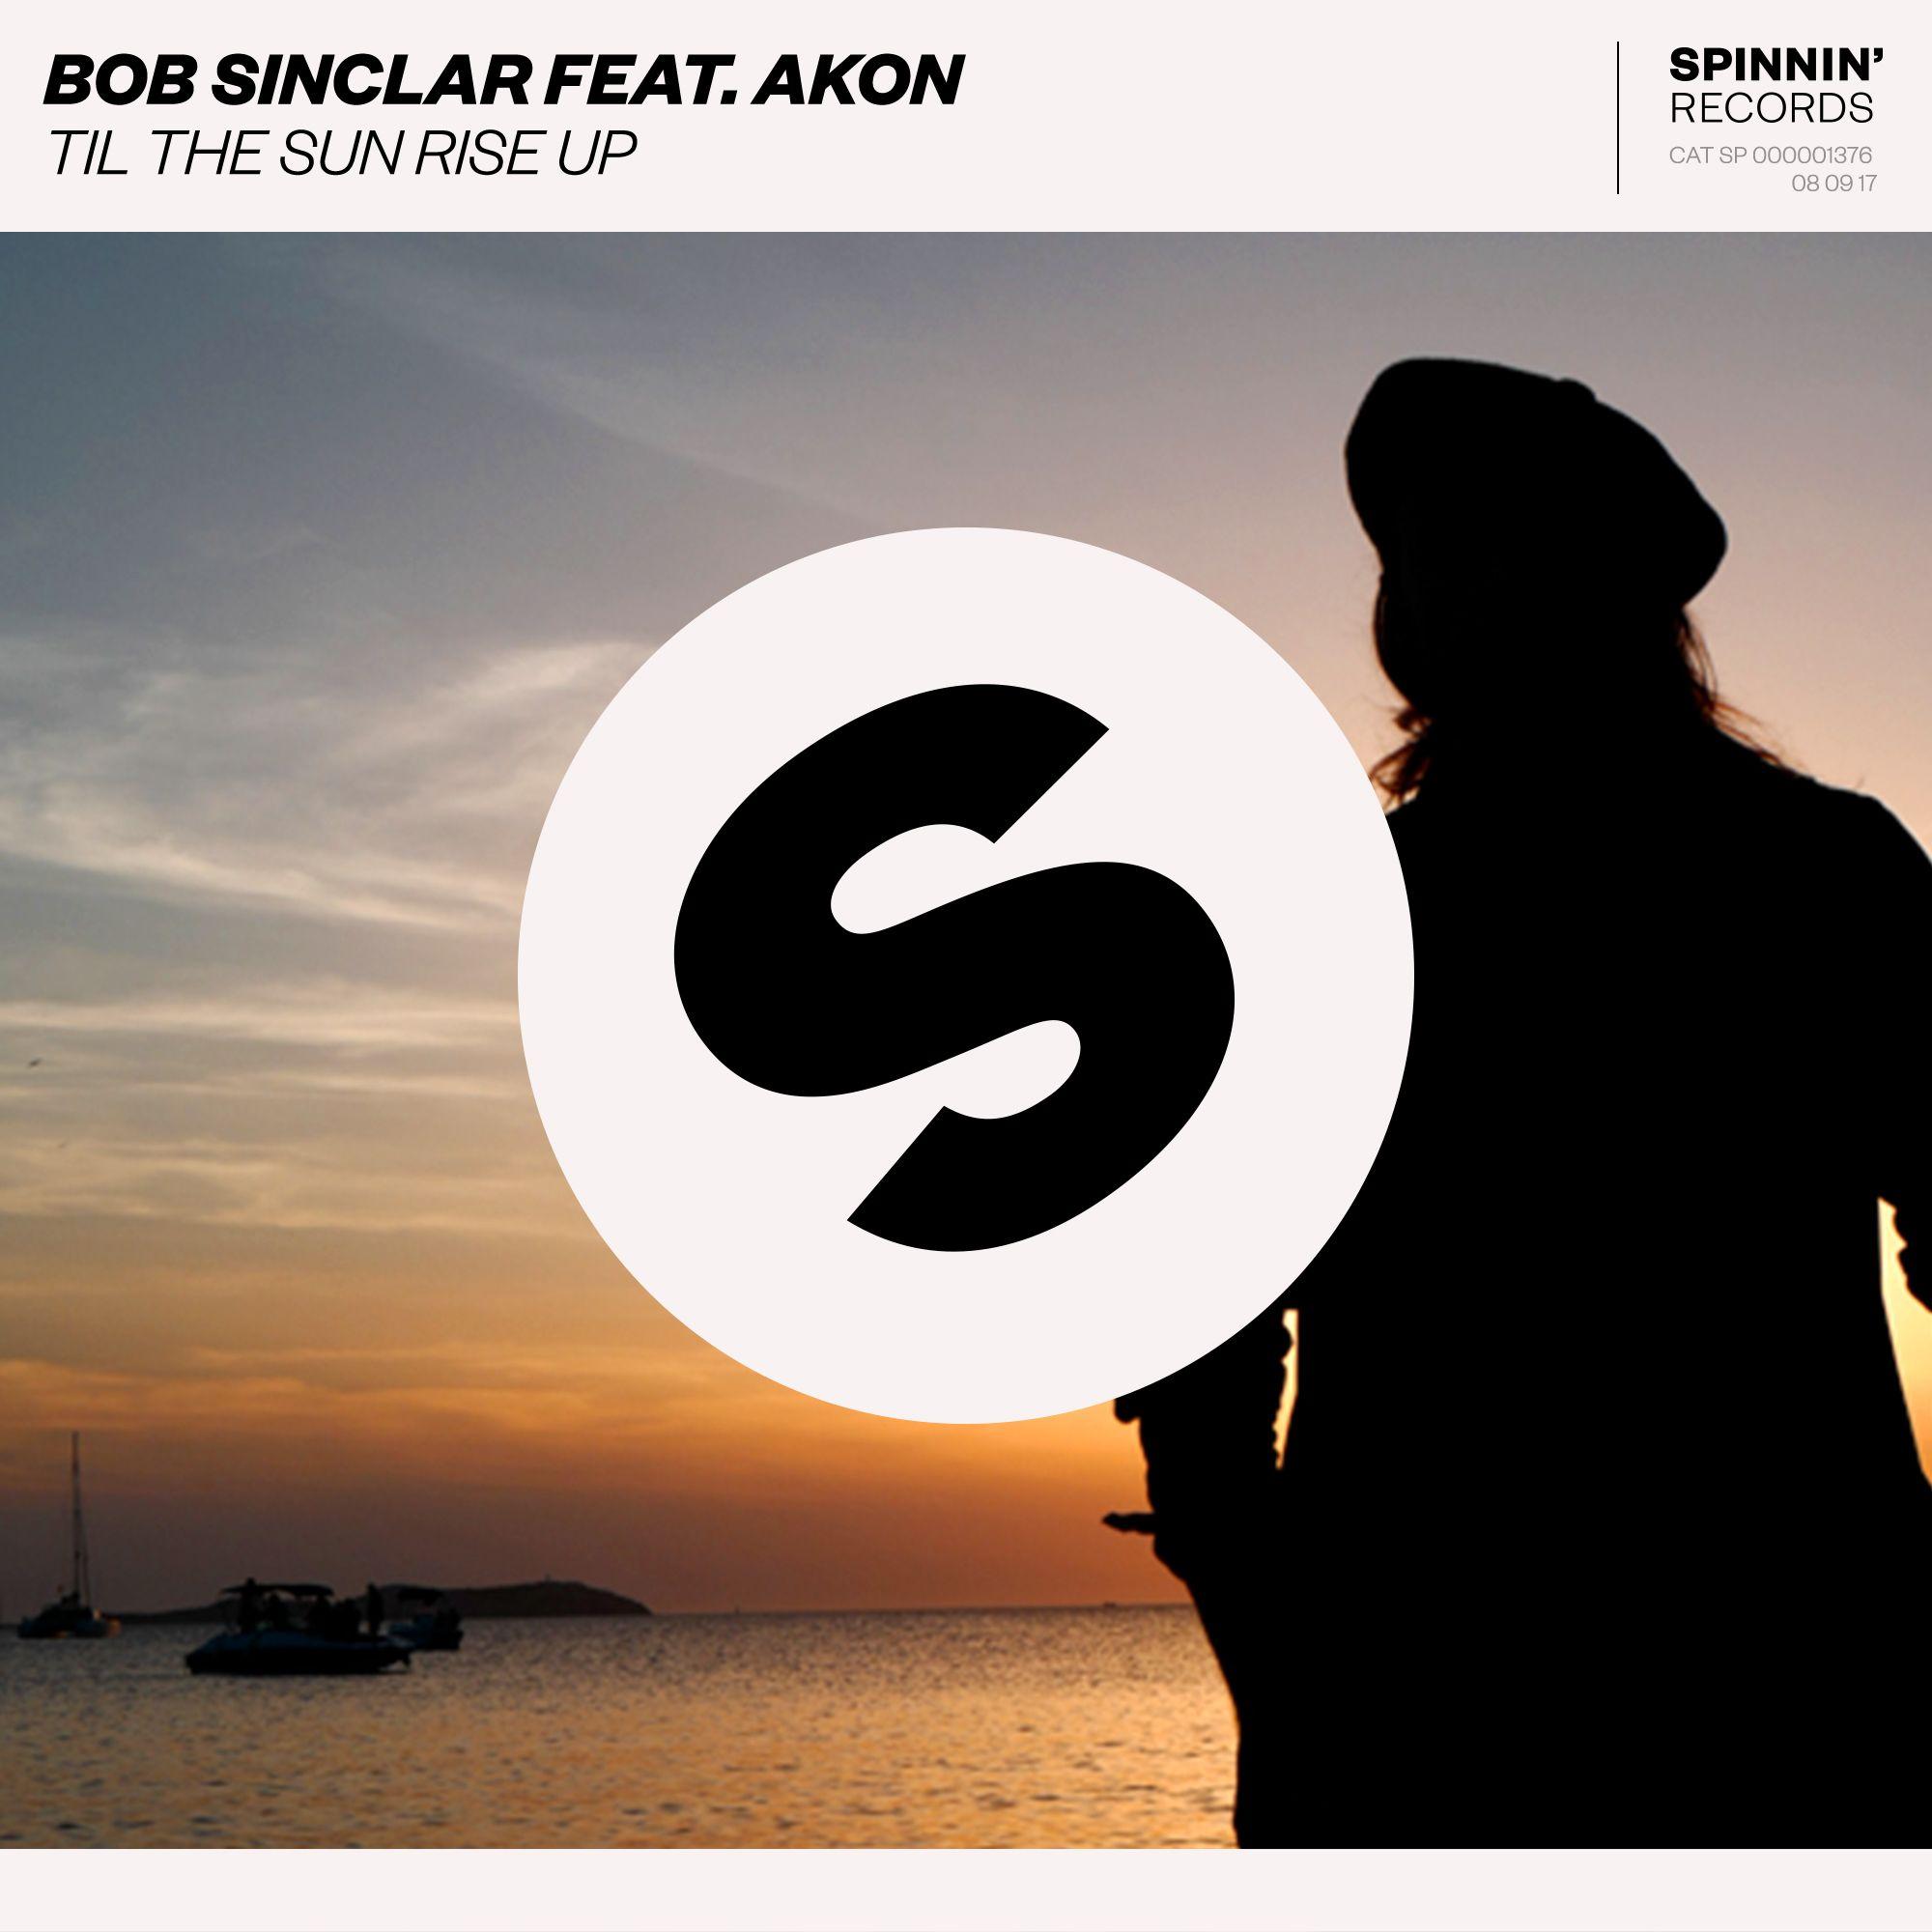 bob_sinclar_feat_akon_til_the_sun_rise_up.jpg